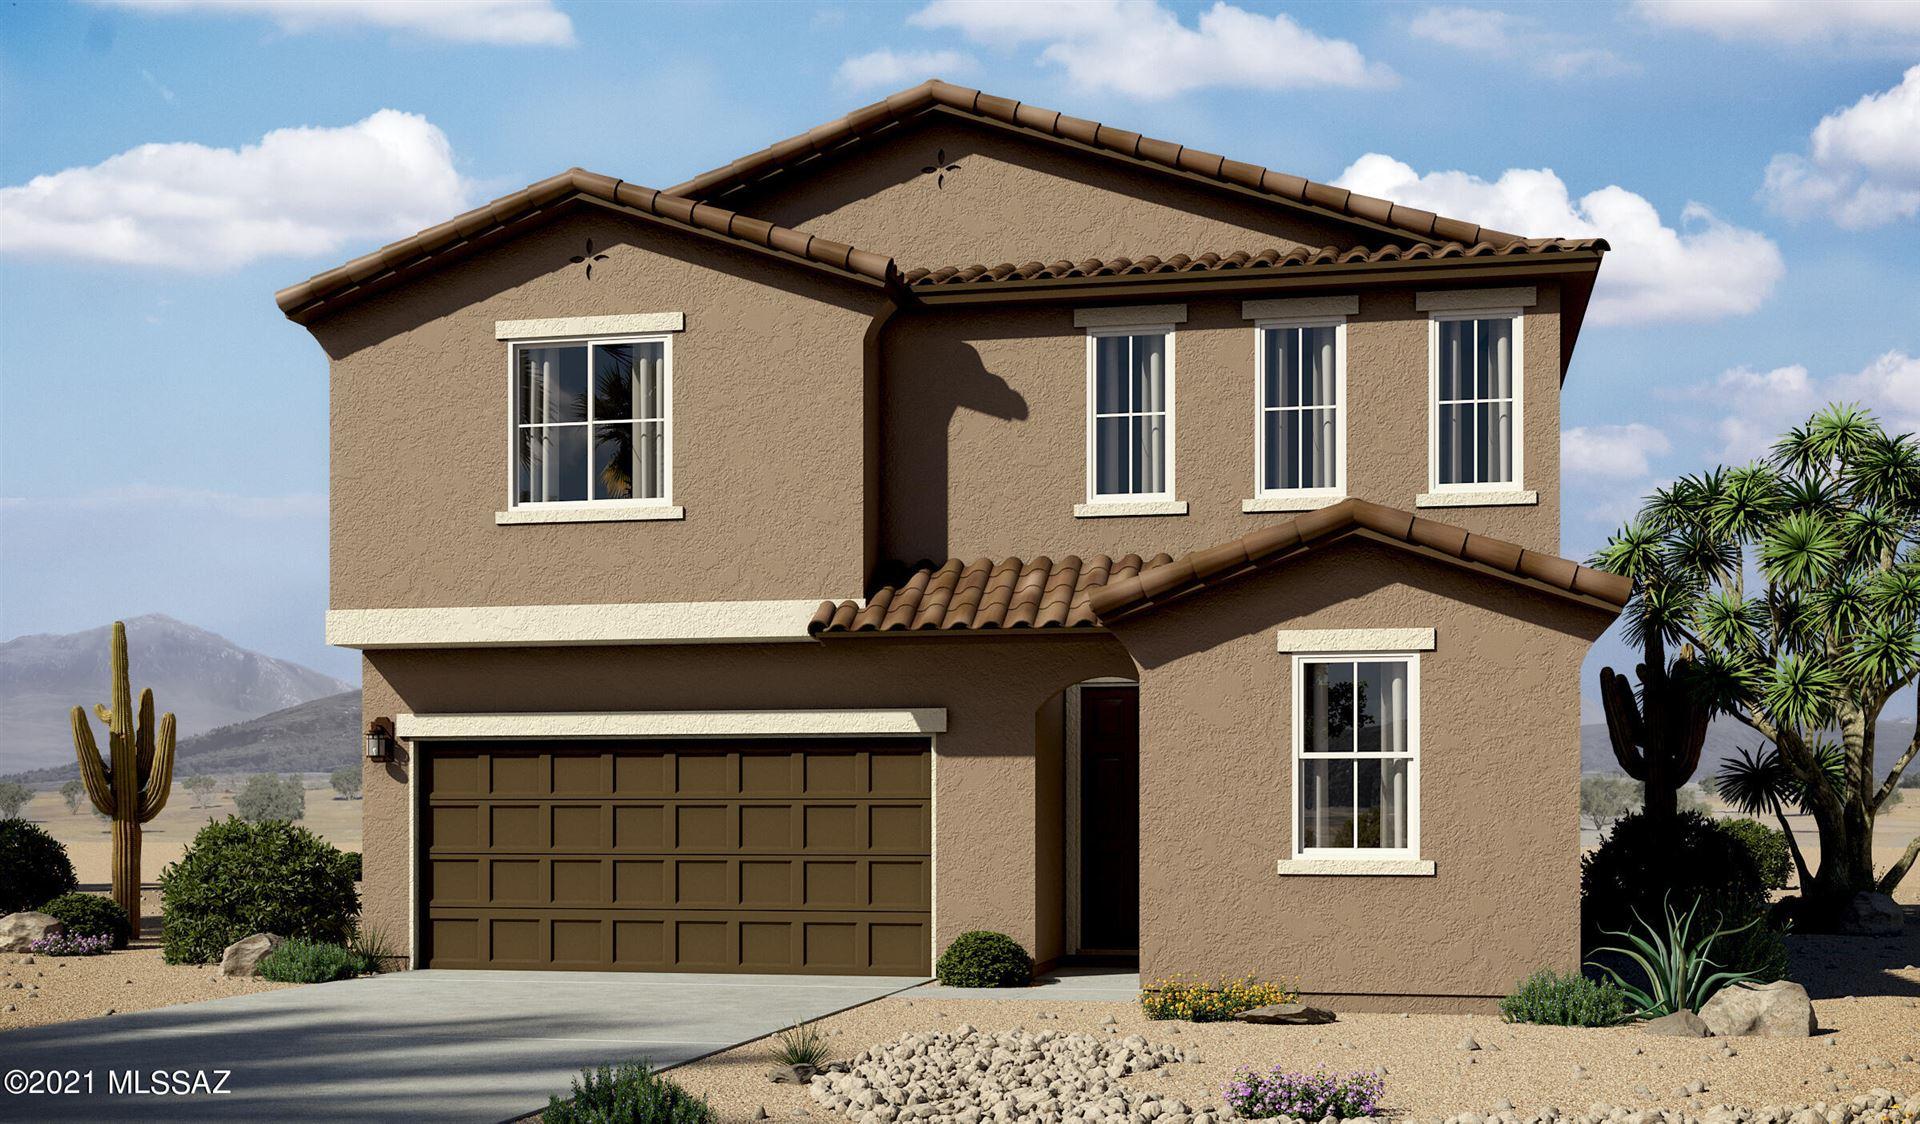 1035 W Calle Moa, Sahuarita, AZ 85629 - MLS#: 22104173